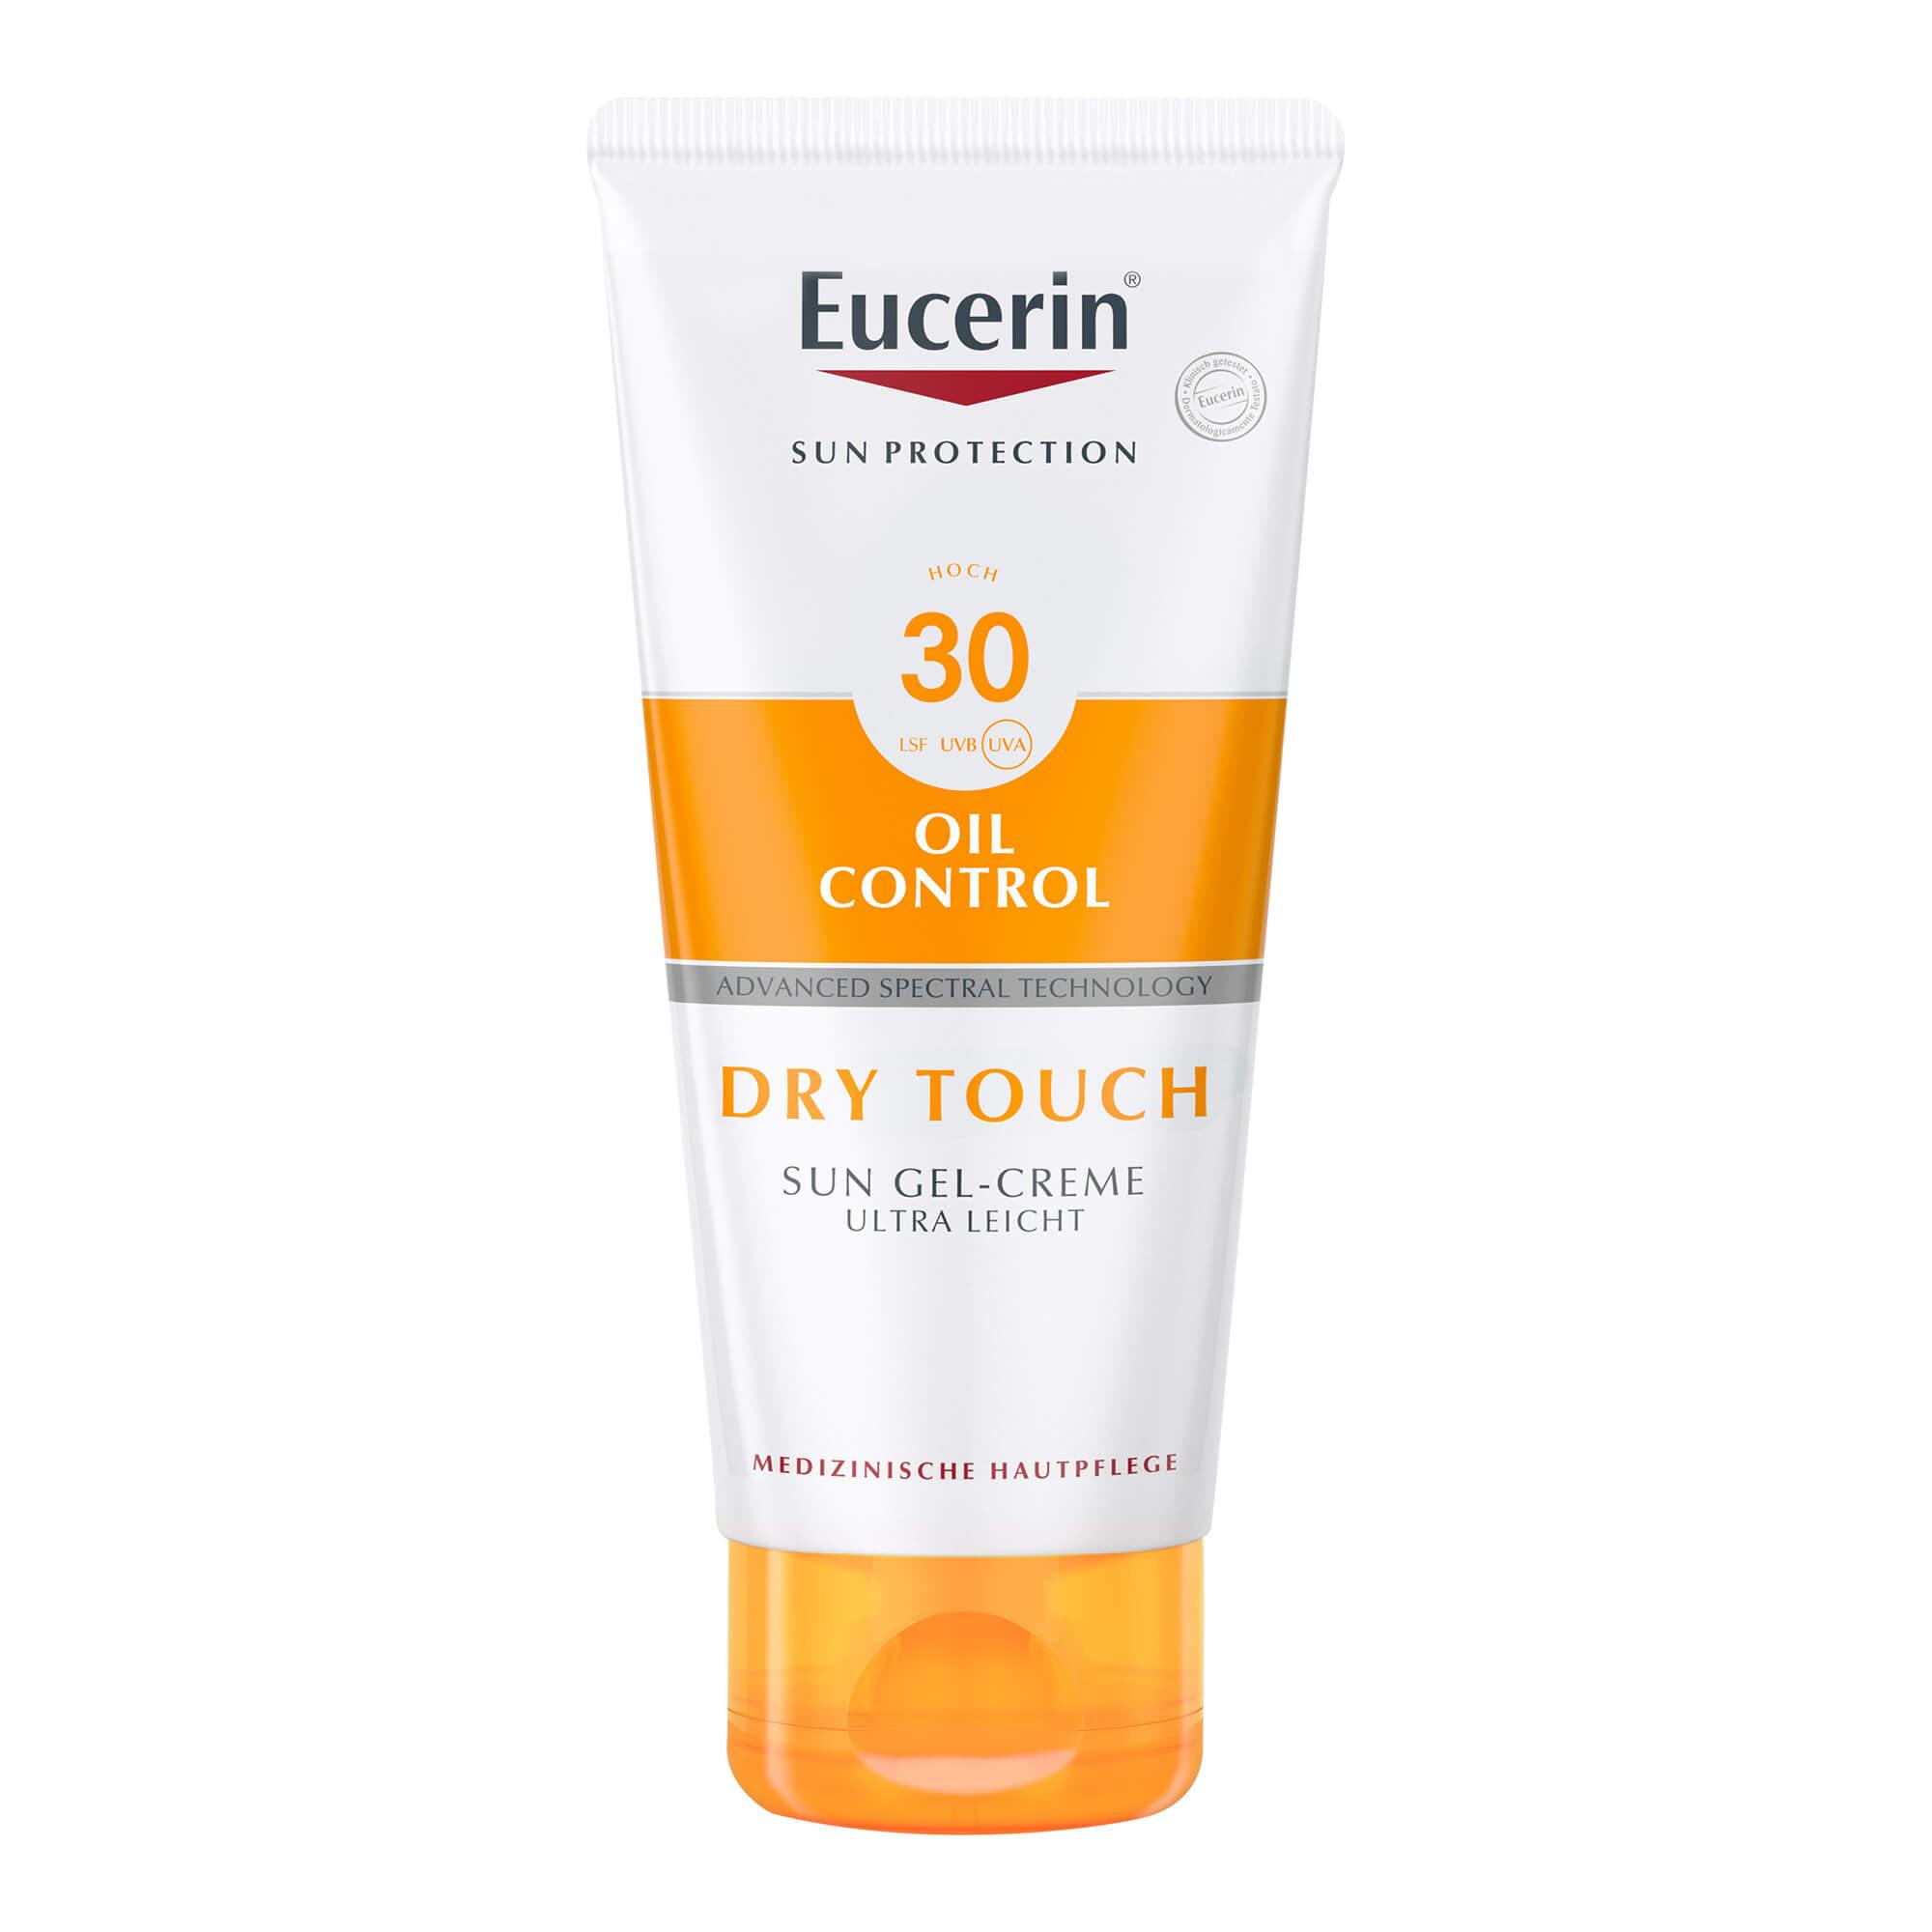 Eucerin Sun Gel-Creme Oil Control Body LSF 30